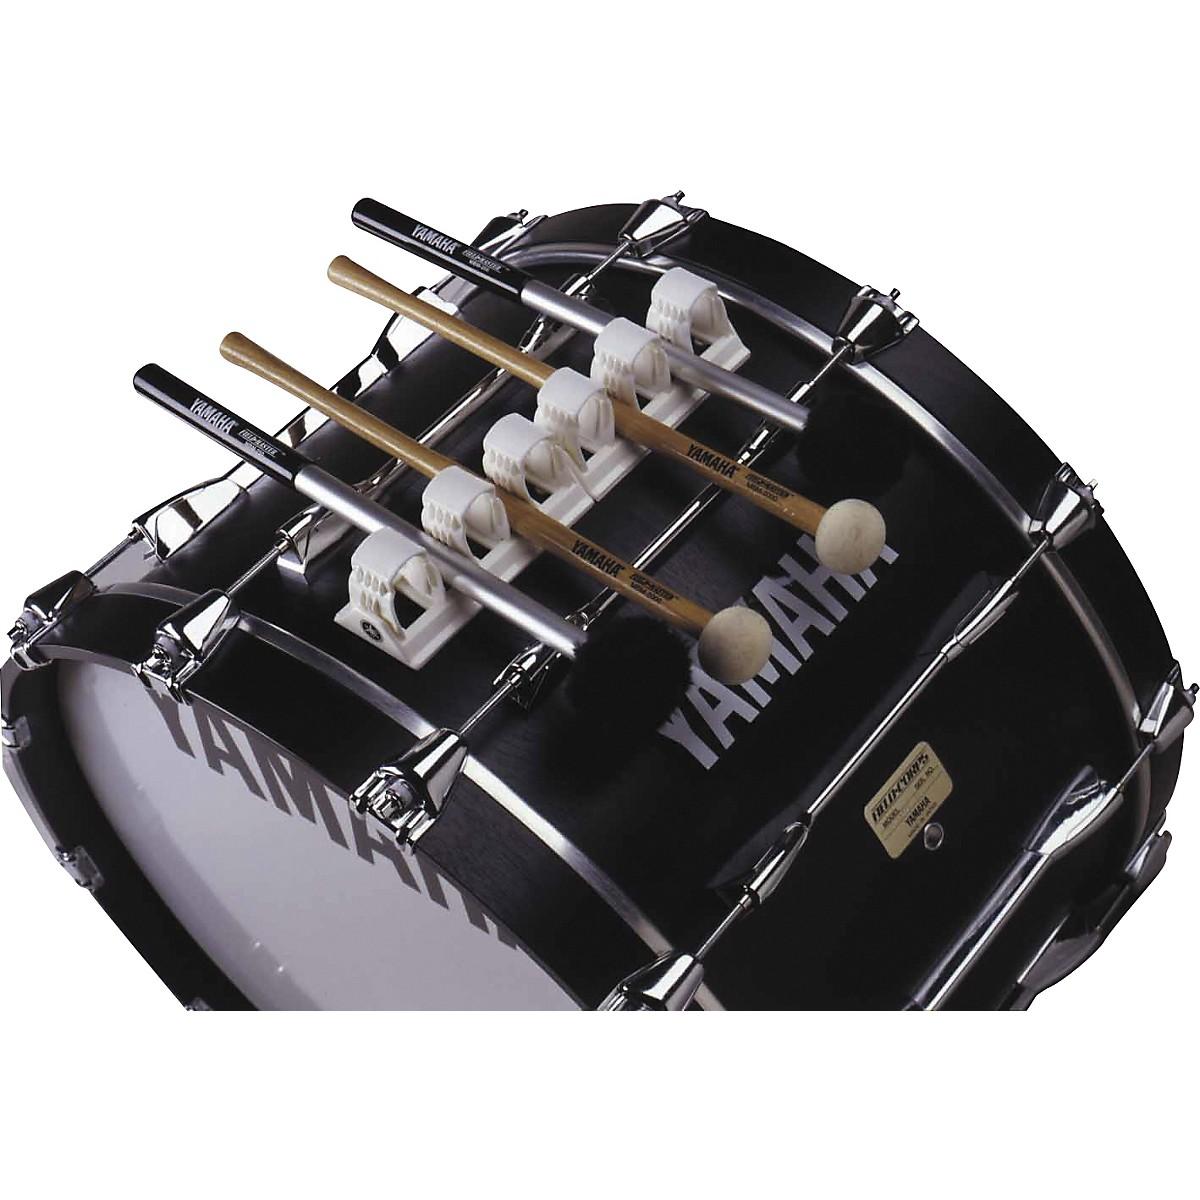 Yamaha MBMH2 Marching Bass Drum Mallet Holder